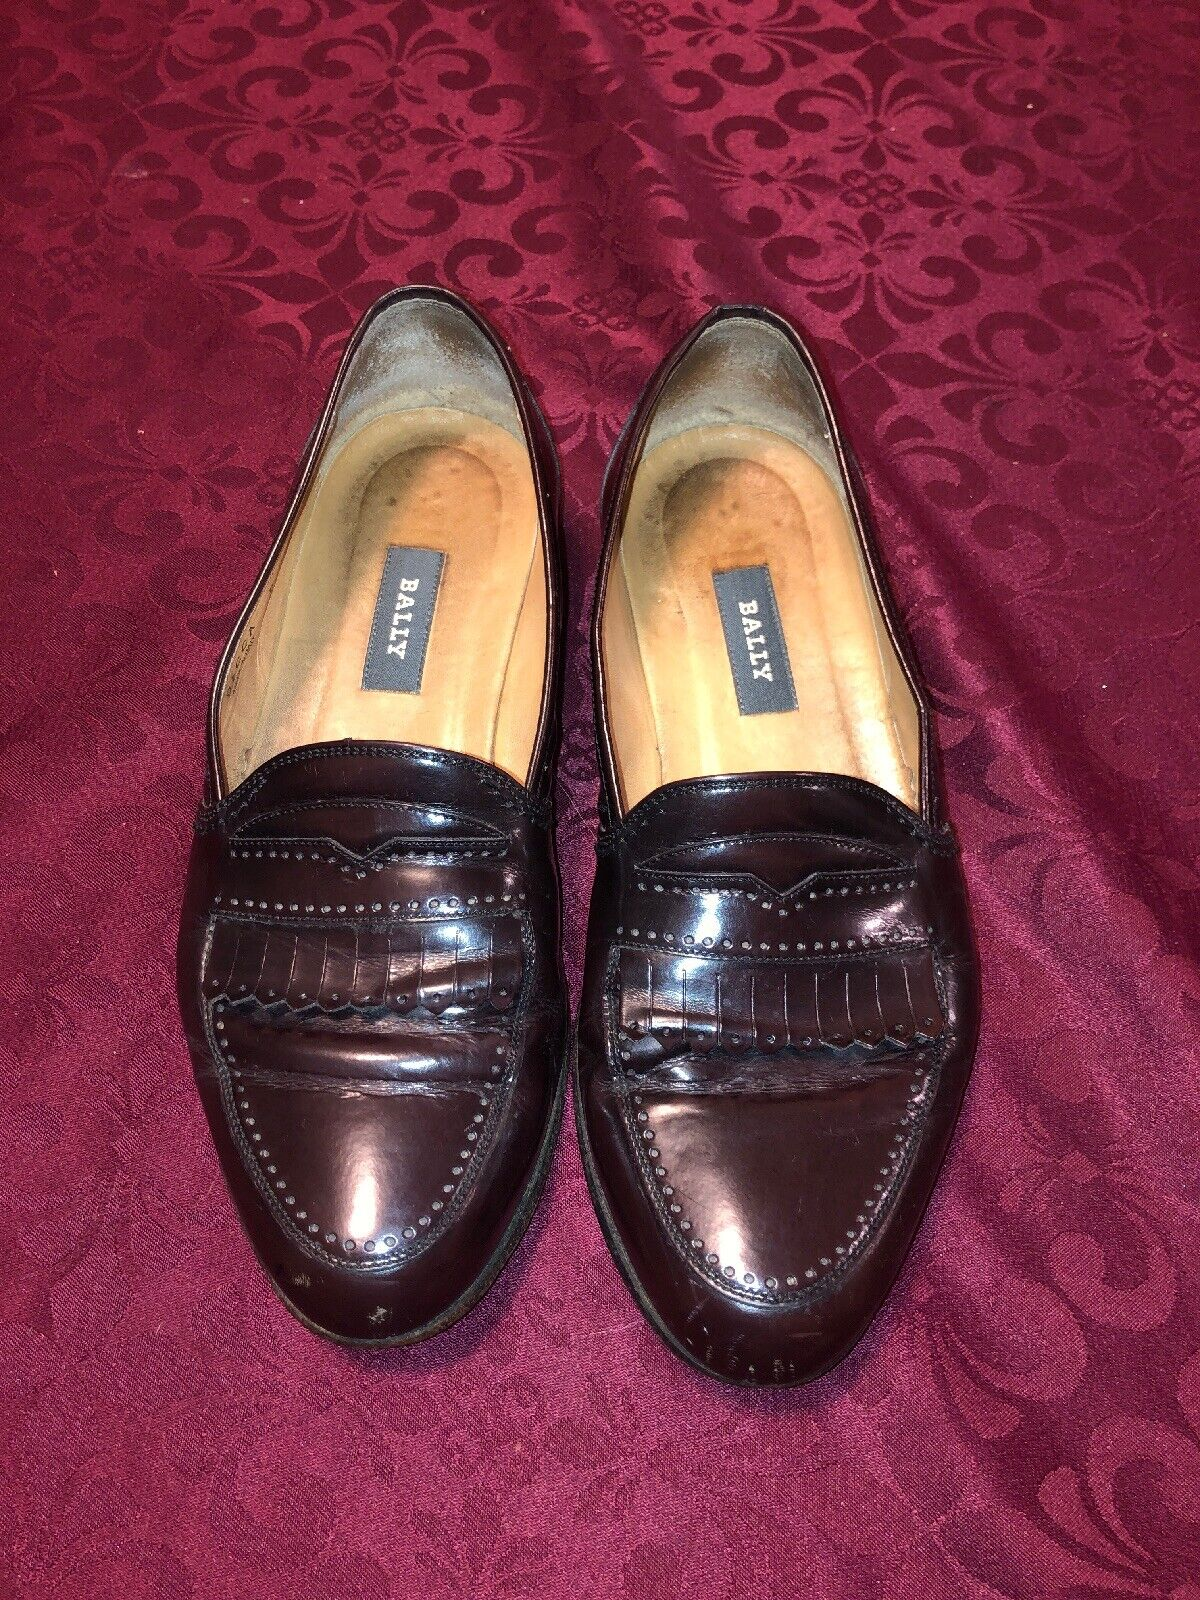 Bally Decca Brown Italian slip on loafers Mens dress shoes sz 8